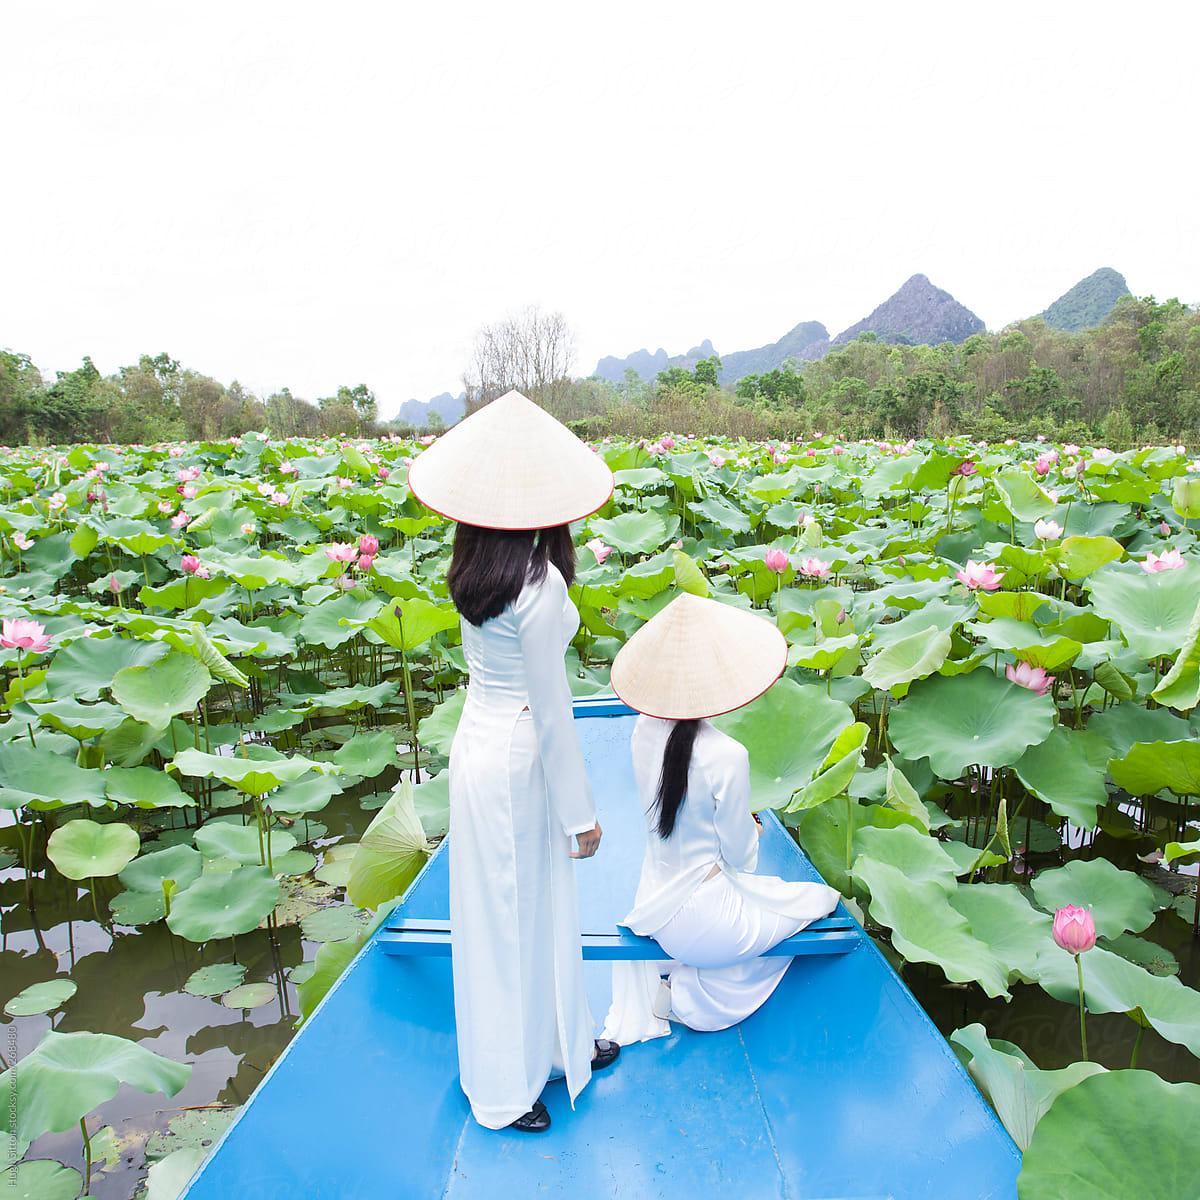 Two Vietnamese Women On Boat In Lake With Lotus Flowers Stocksy